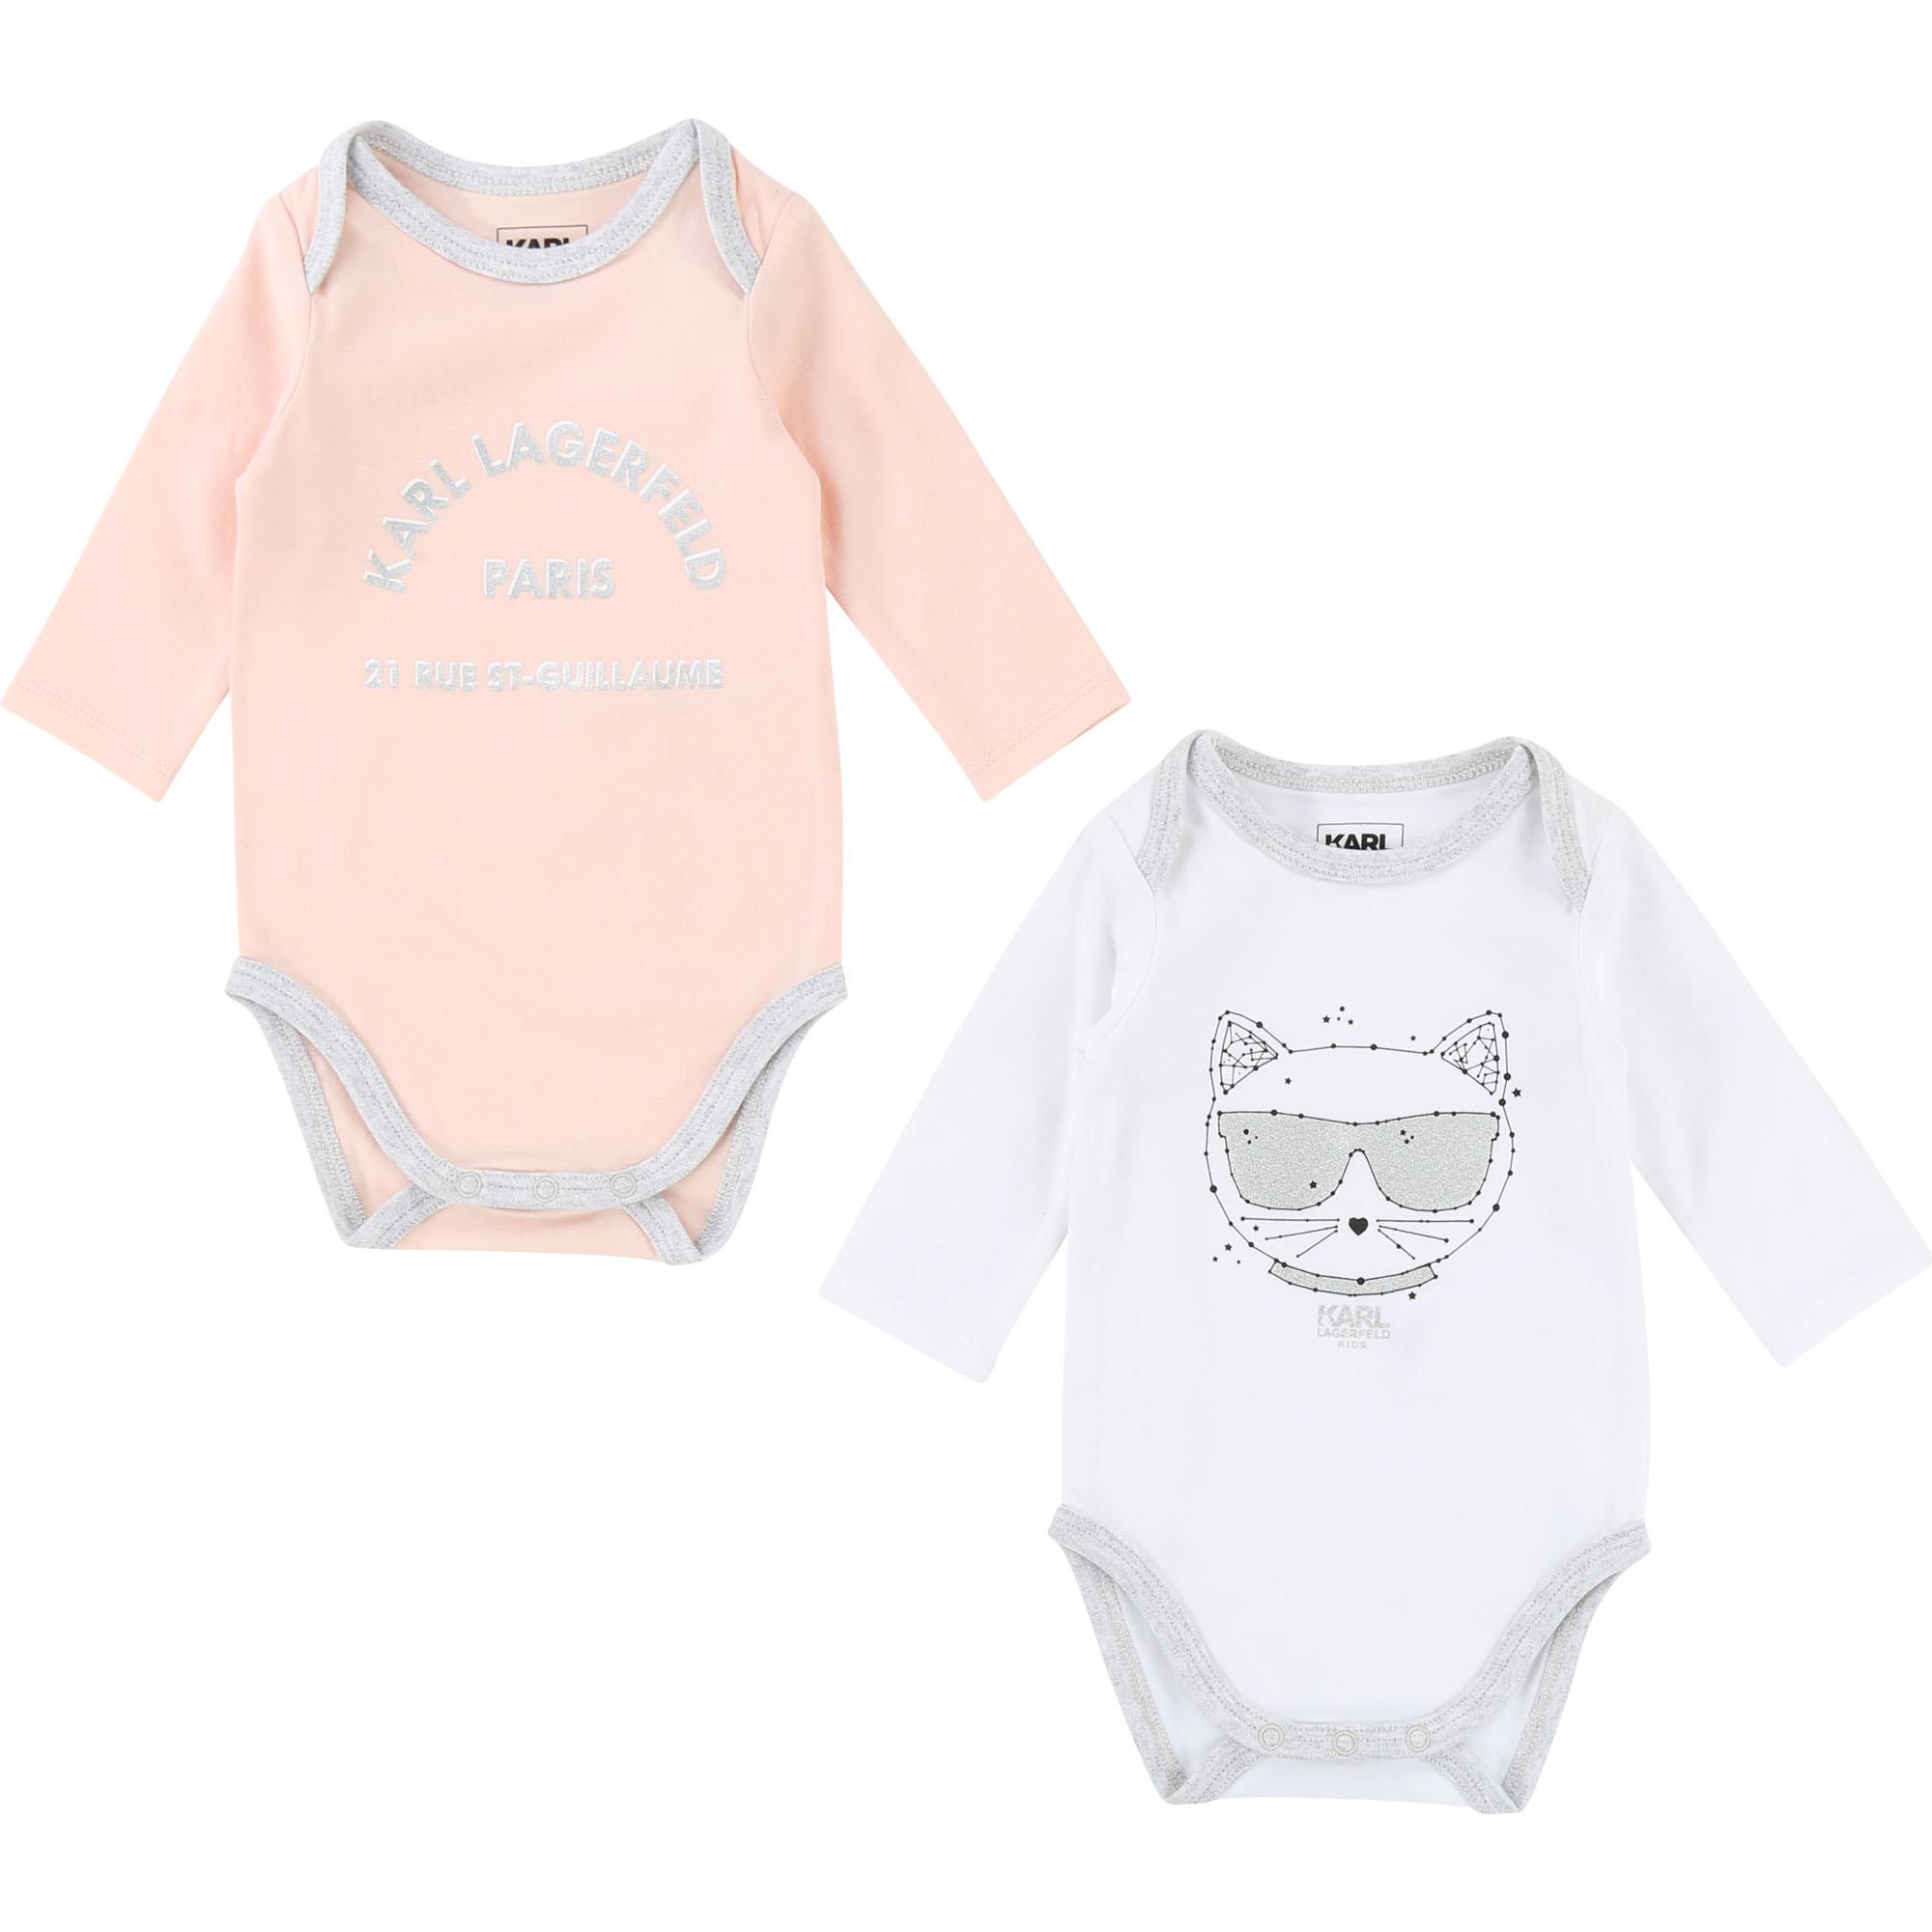 Karl Lagerfeld Baby Body Set in rosa-weiss